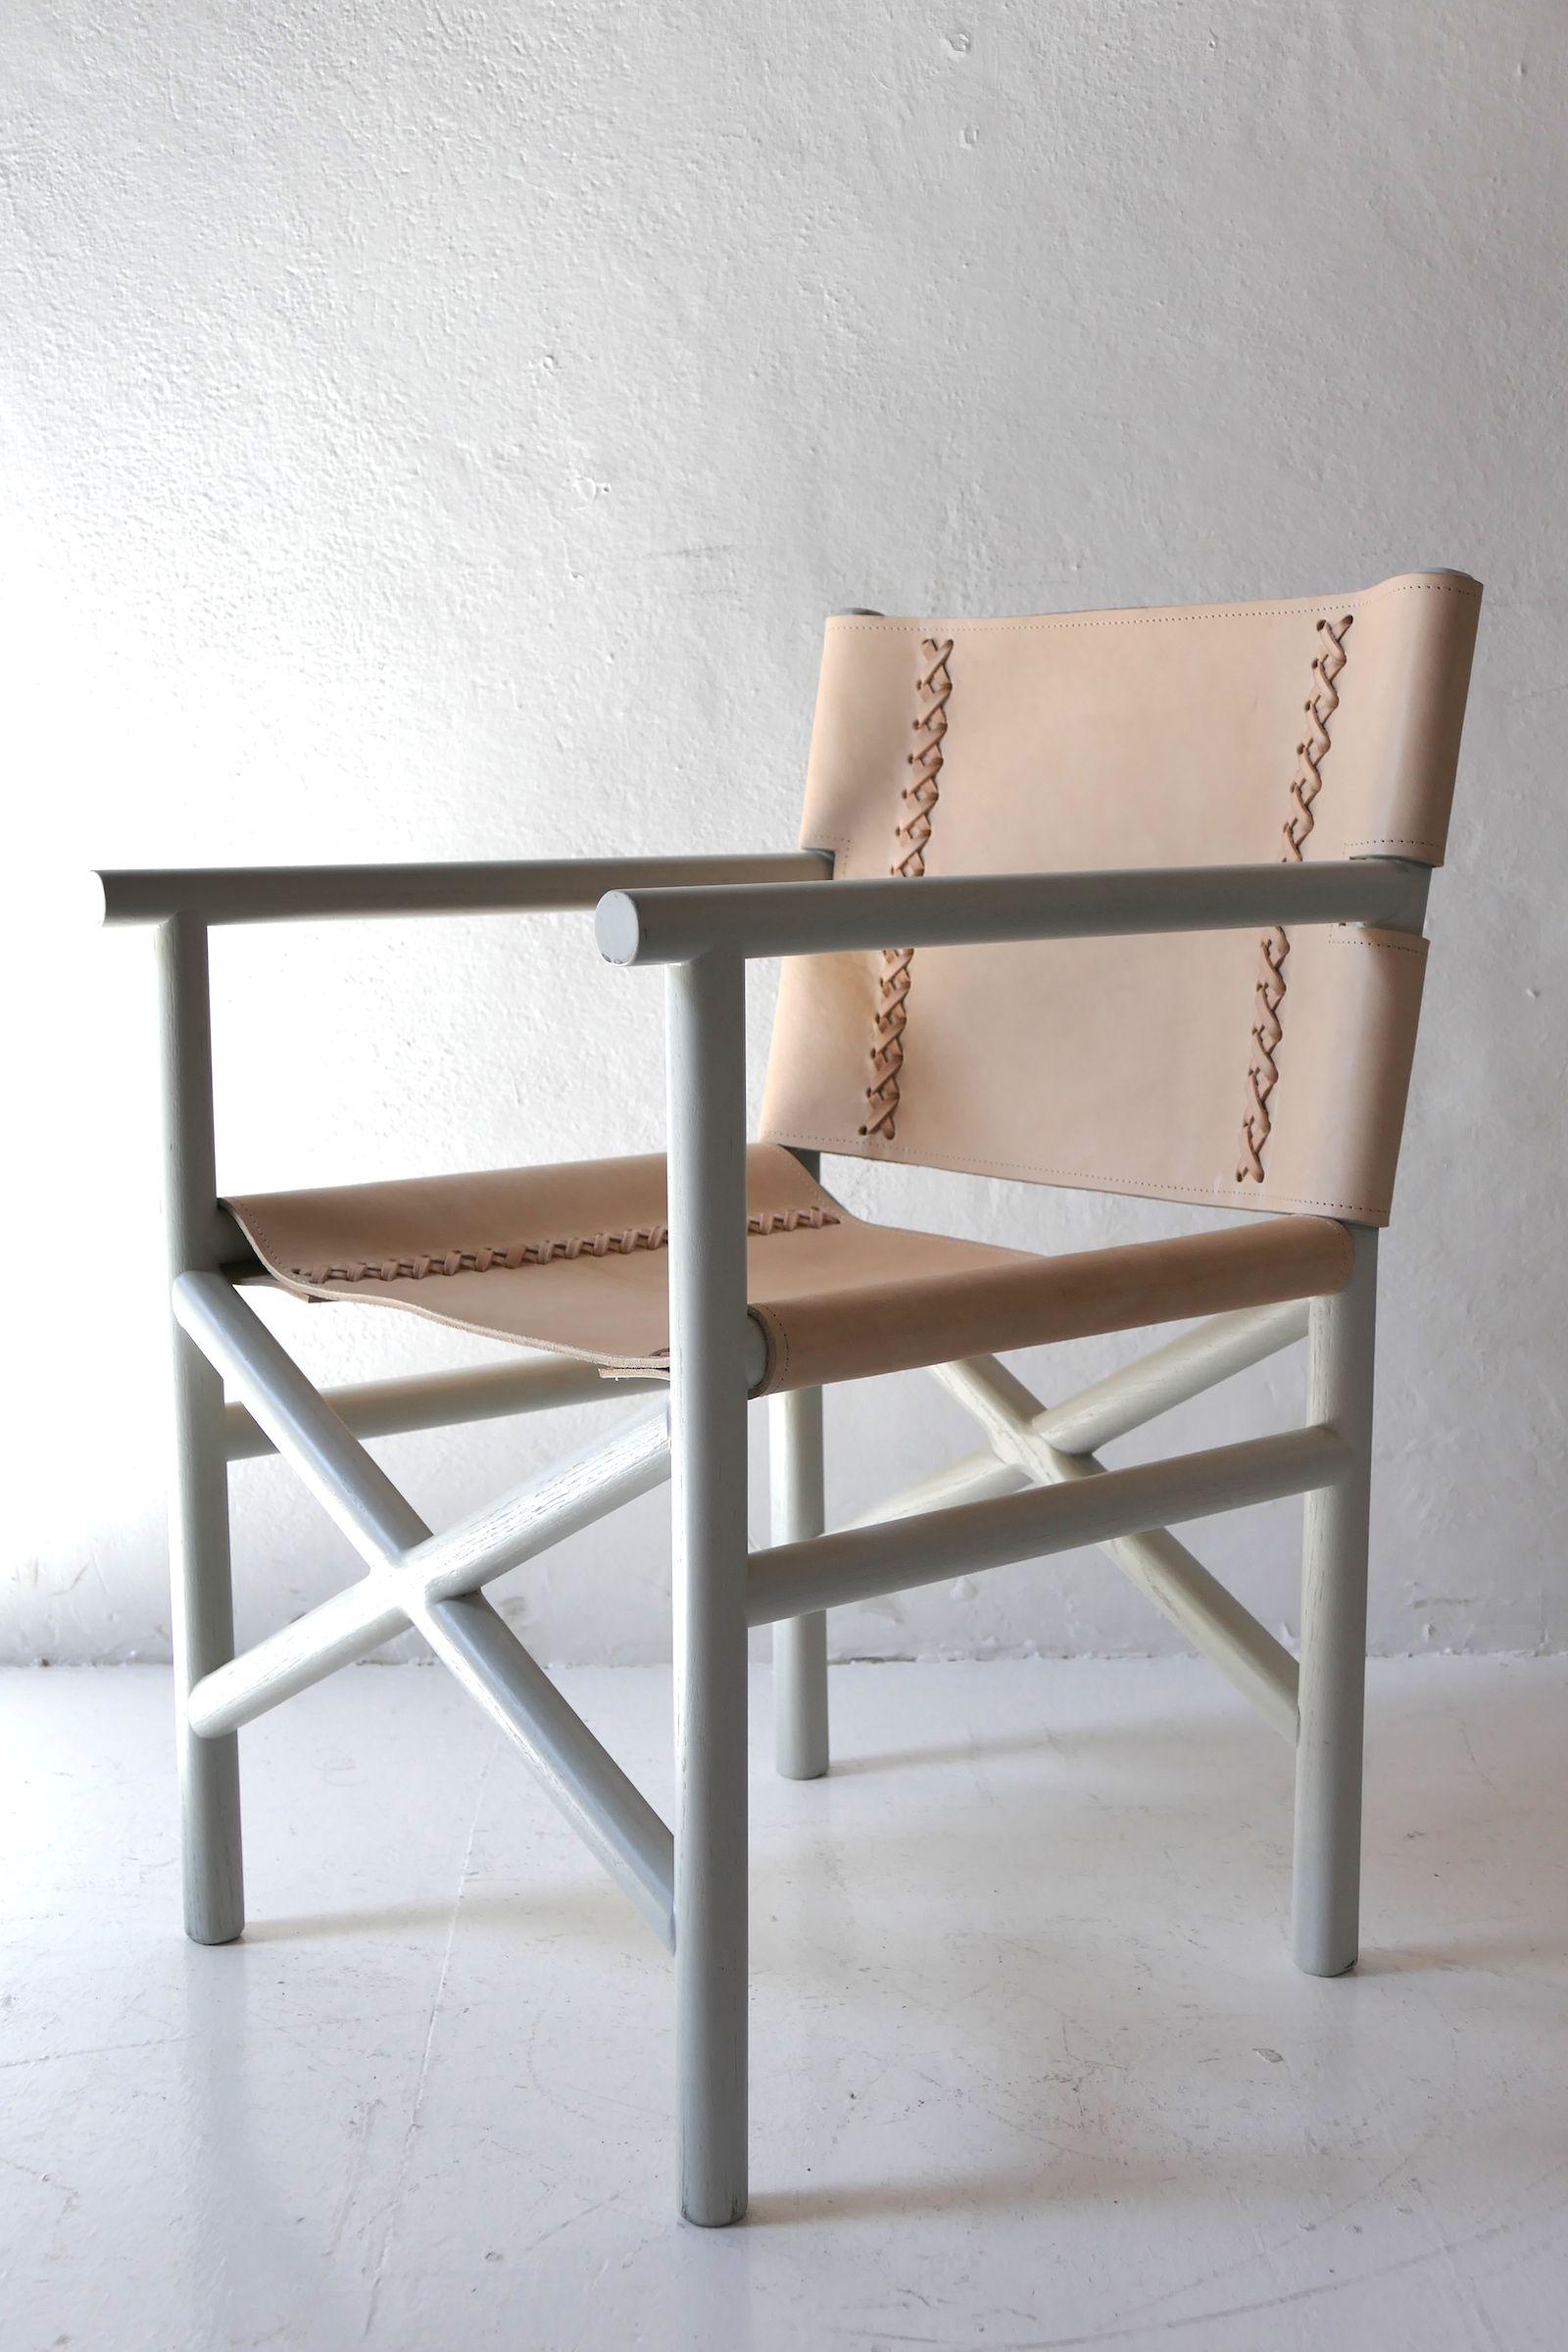 casamidi olivier saddle leather armchair single chairs rh pinterest com